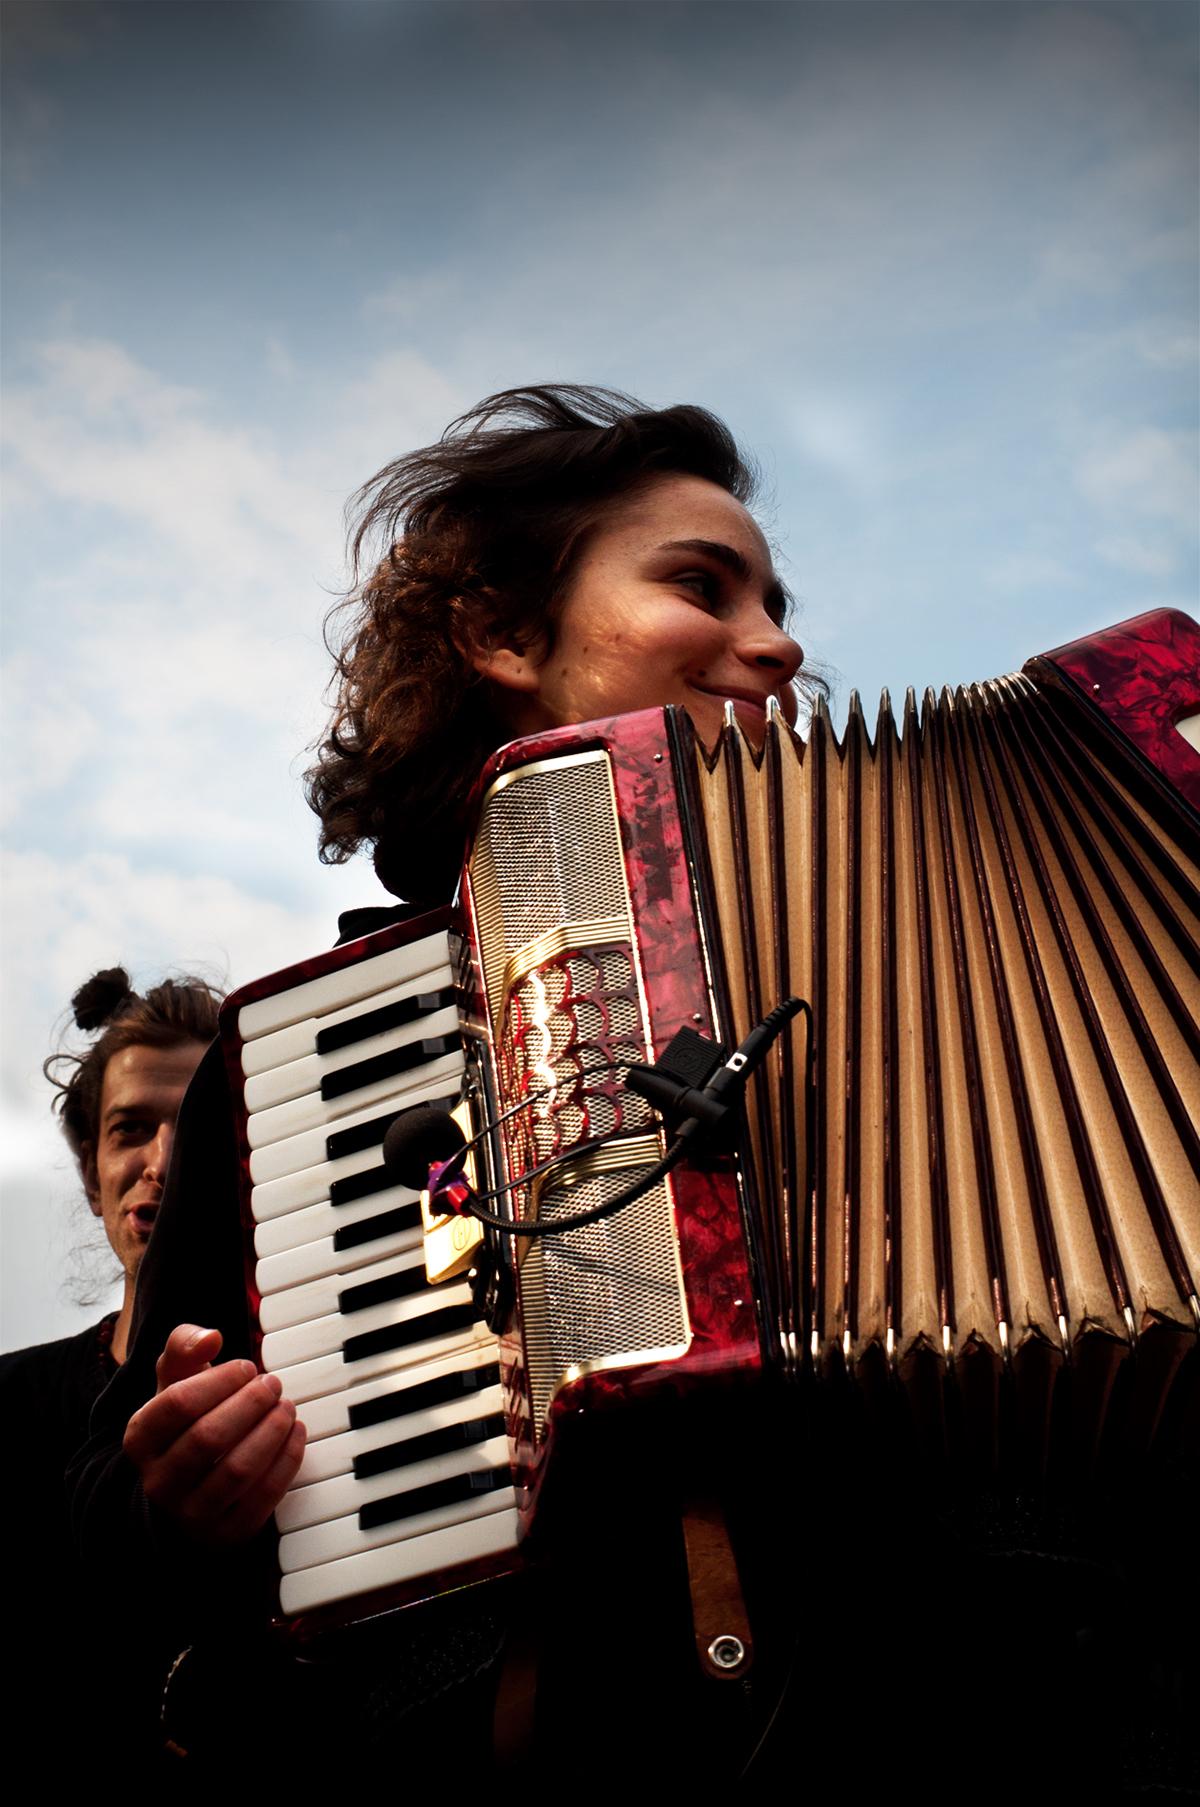 vienna emotion portrait Nature vibration people guitar drums voice cumbia latino